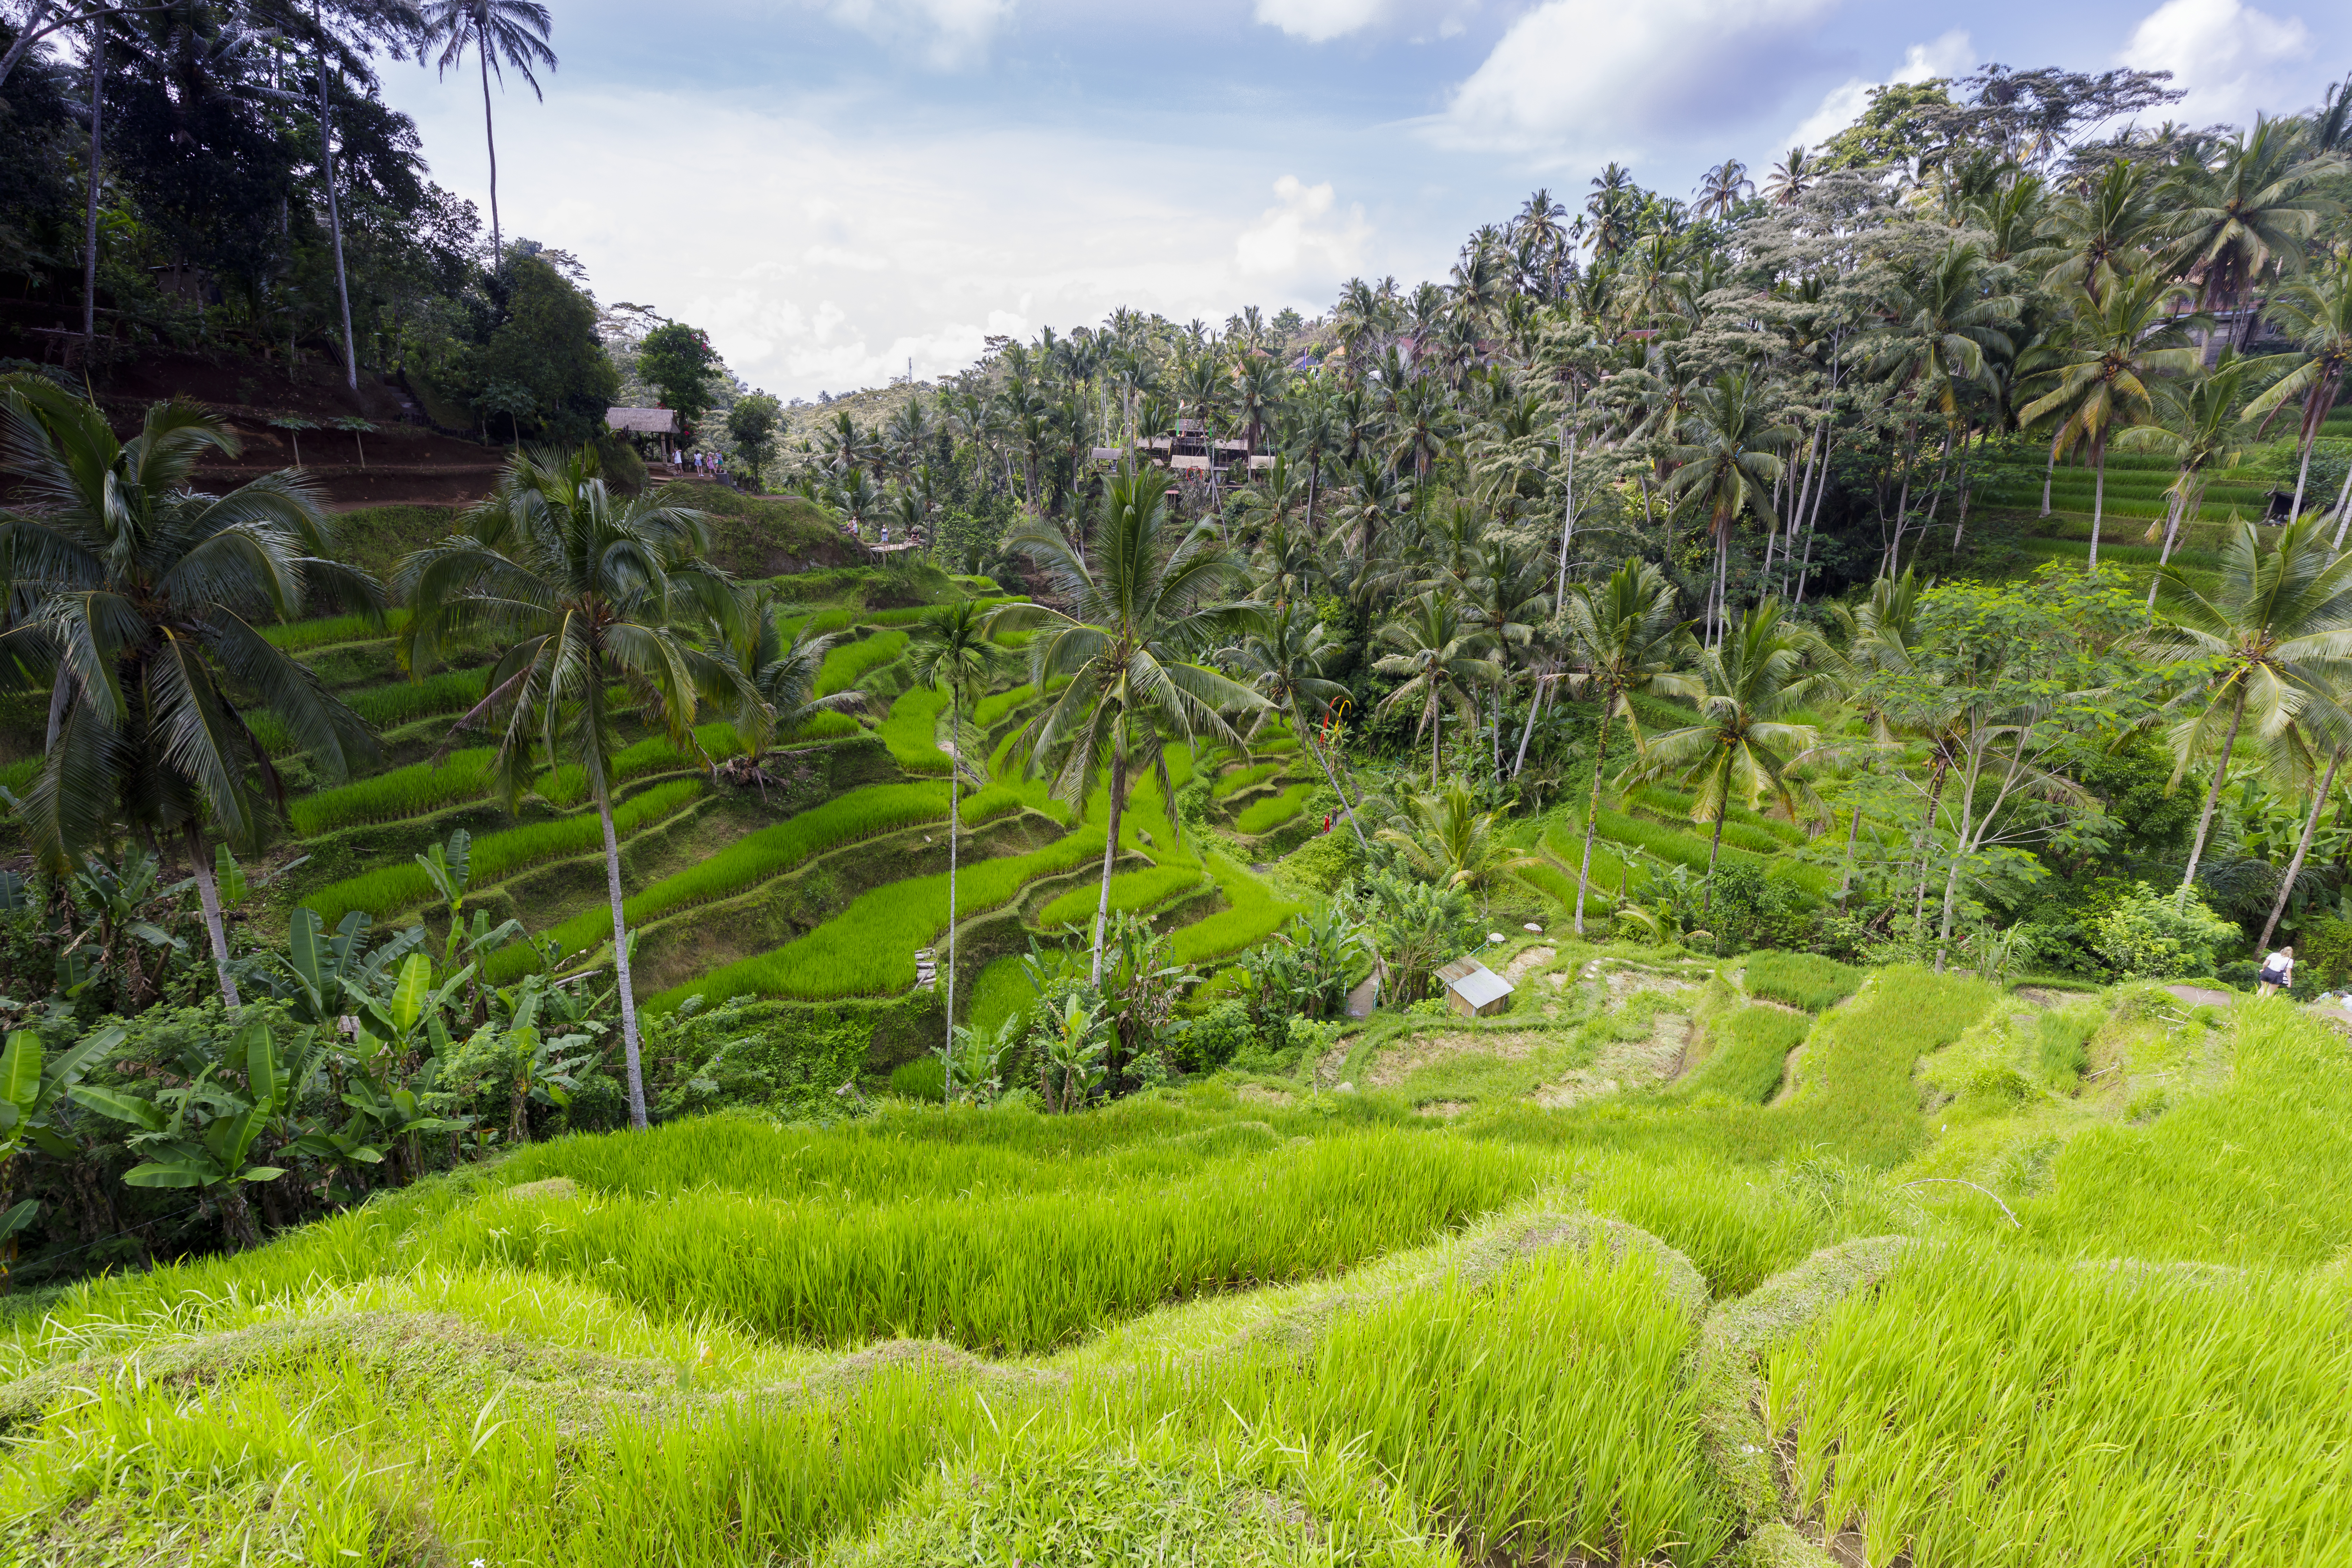 Rice terraces on Bali - Tegalalang Rice Terrace - Indonesia 05.jpg